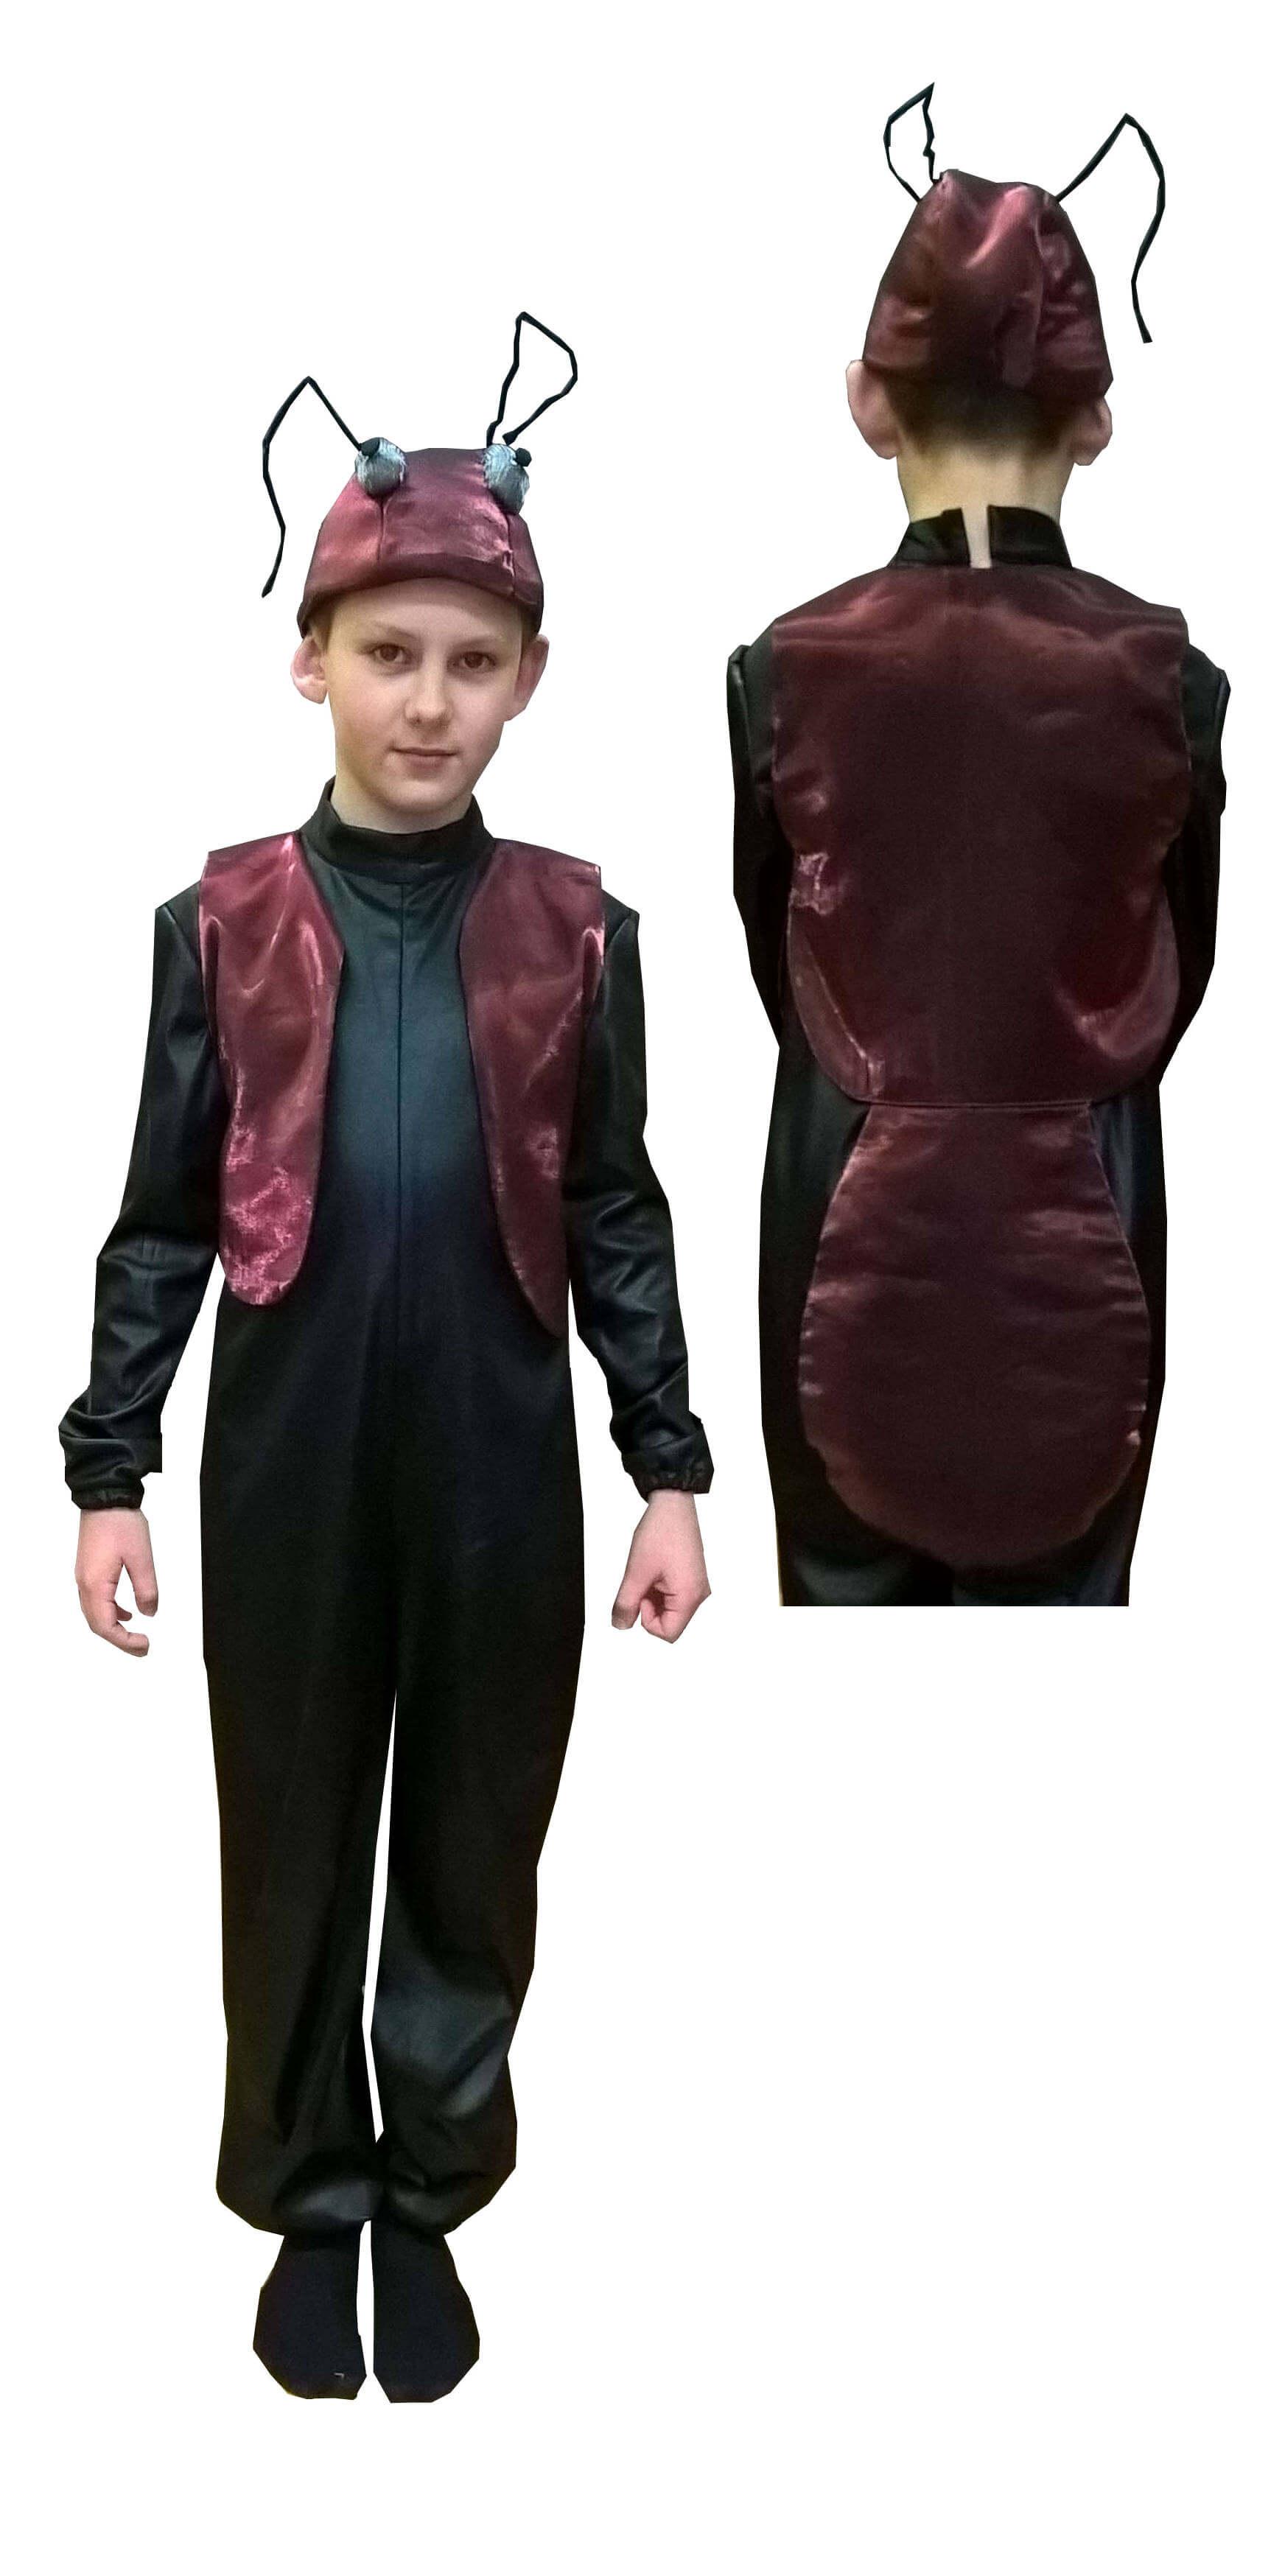 Vabalo kostiumas